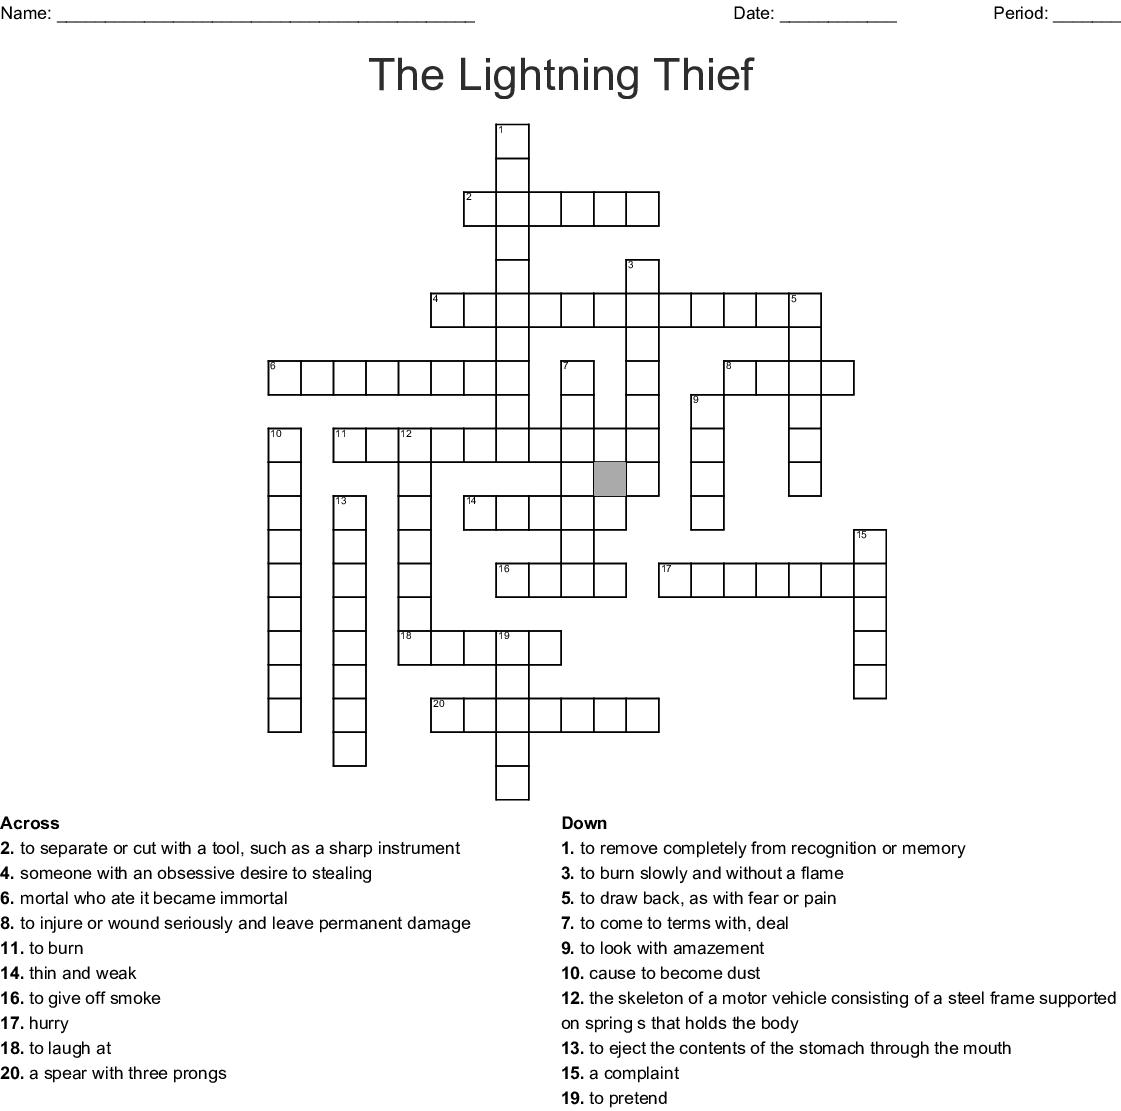 The Lightning Thief Crossword Puzzle - WordMint